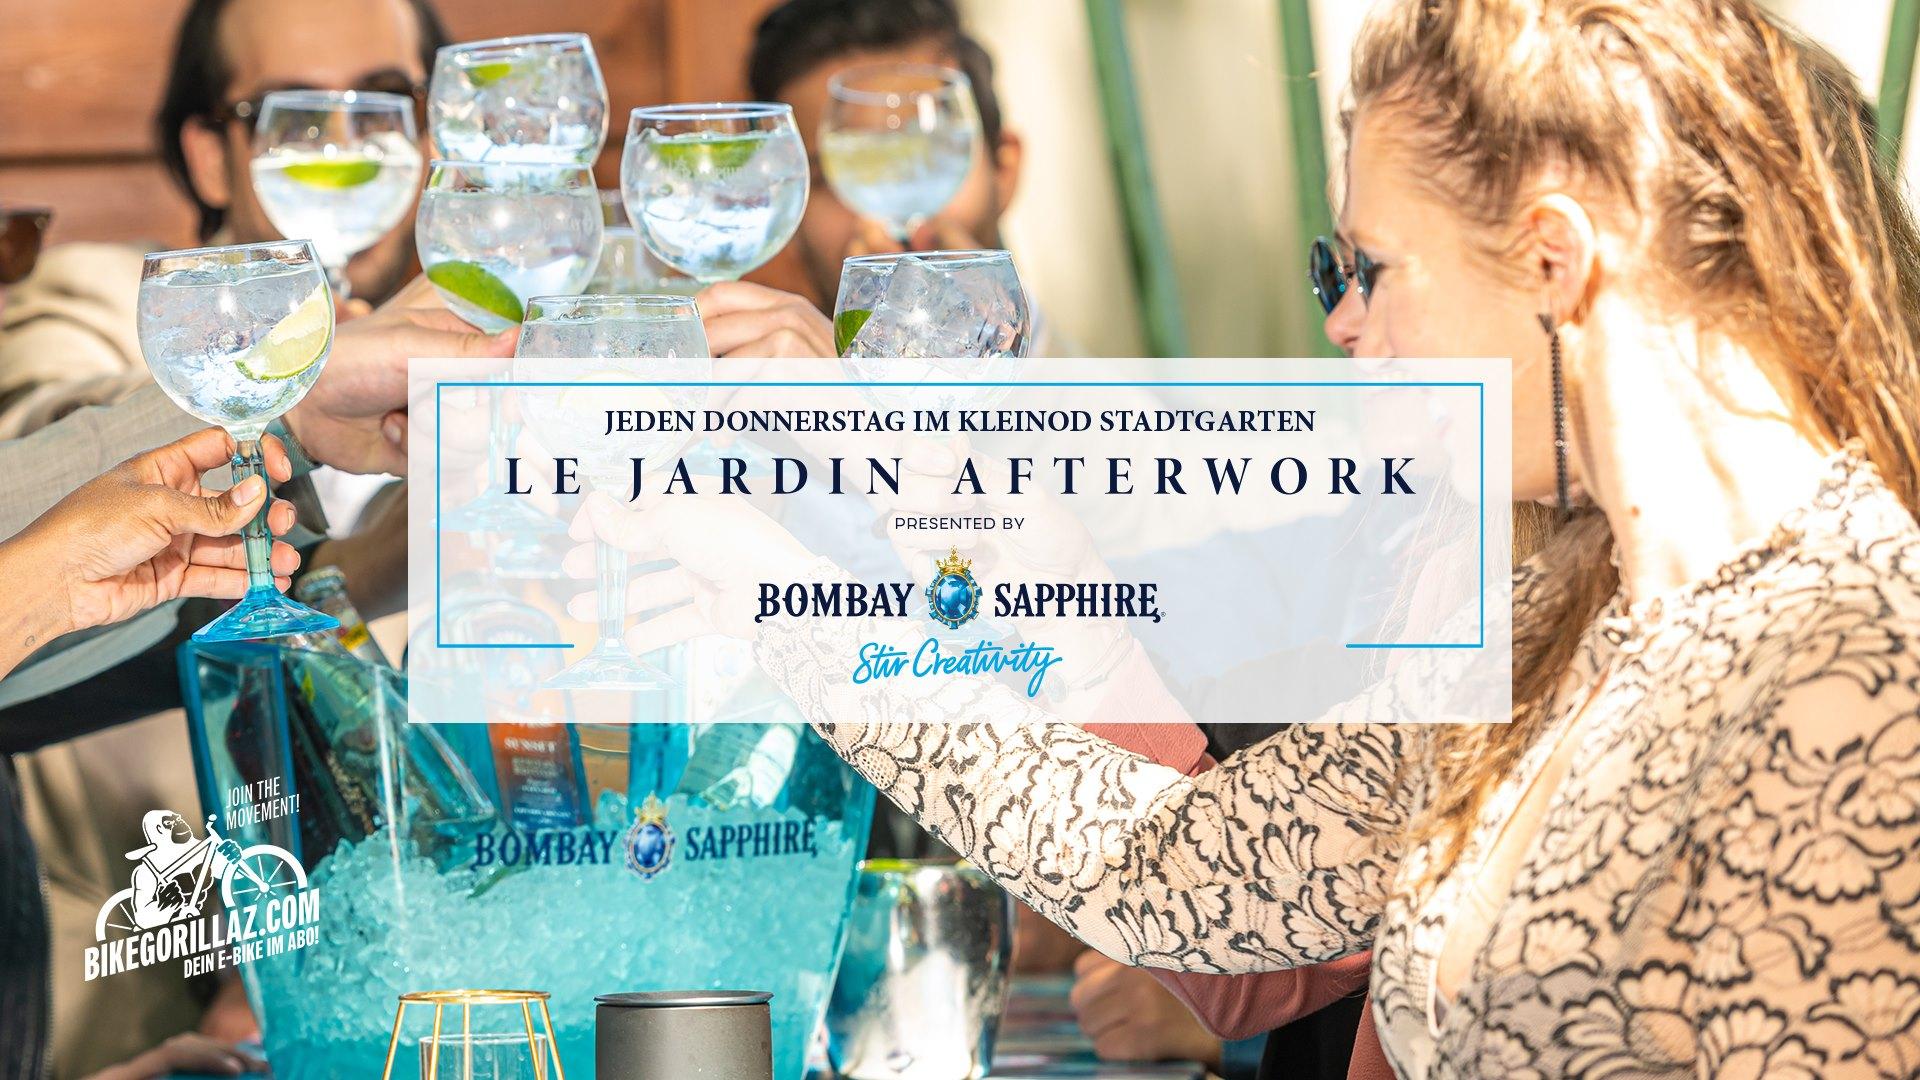 Events Wien: LE JARDIN SOMMER AFTERWORK   JEDEN DONNERSTAG